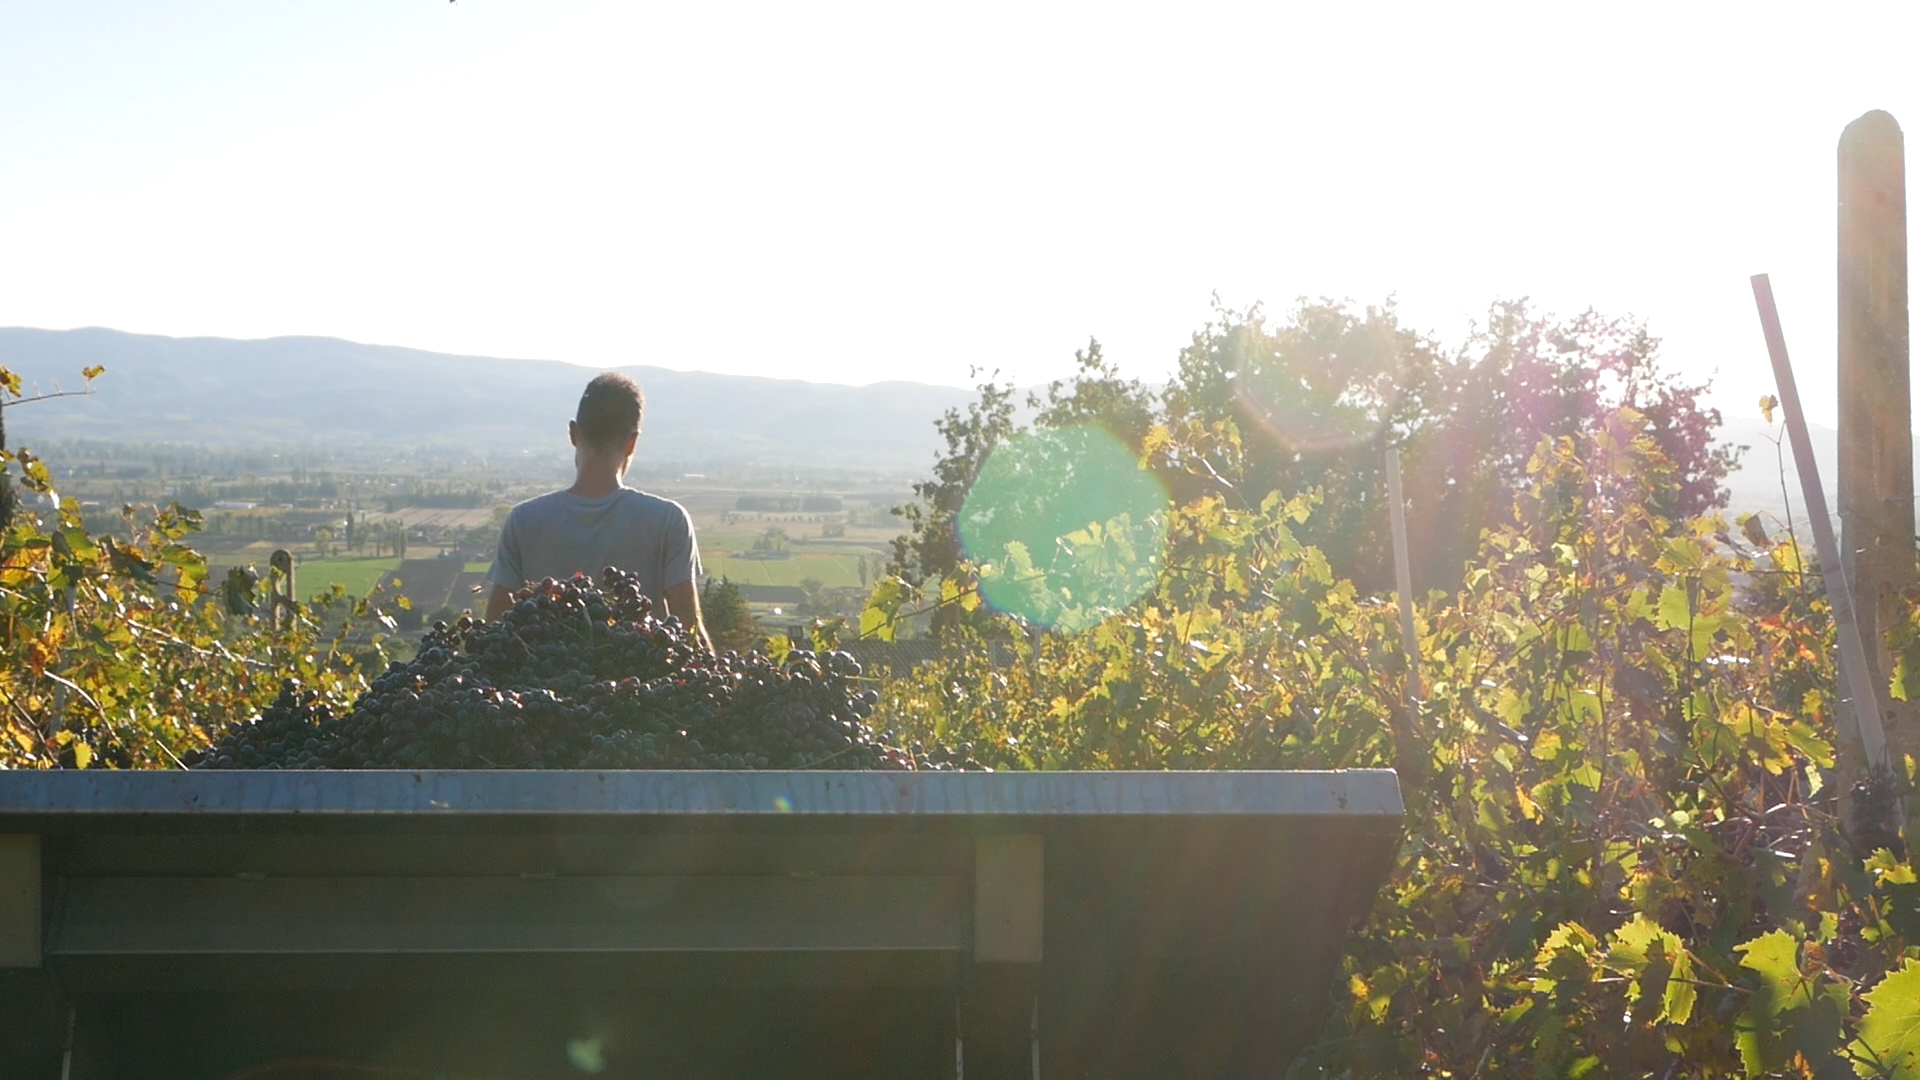 Esperienza sensoriale Assisi Tili Vini - Vendemmiamo insieme 6